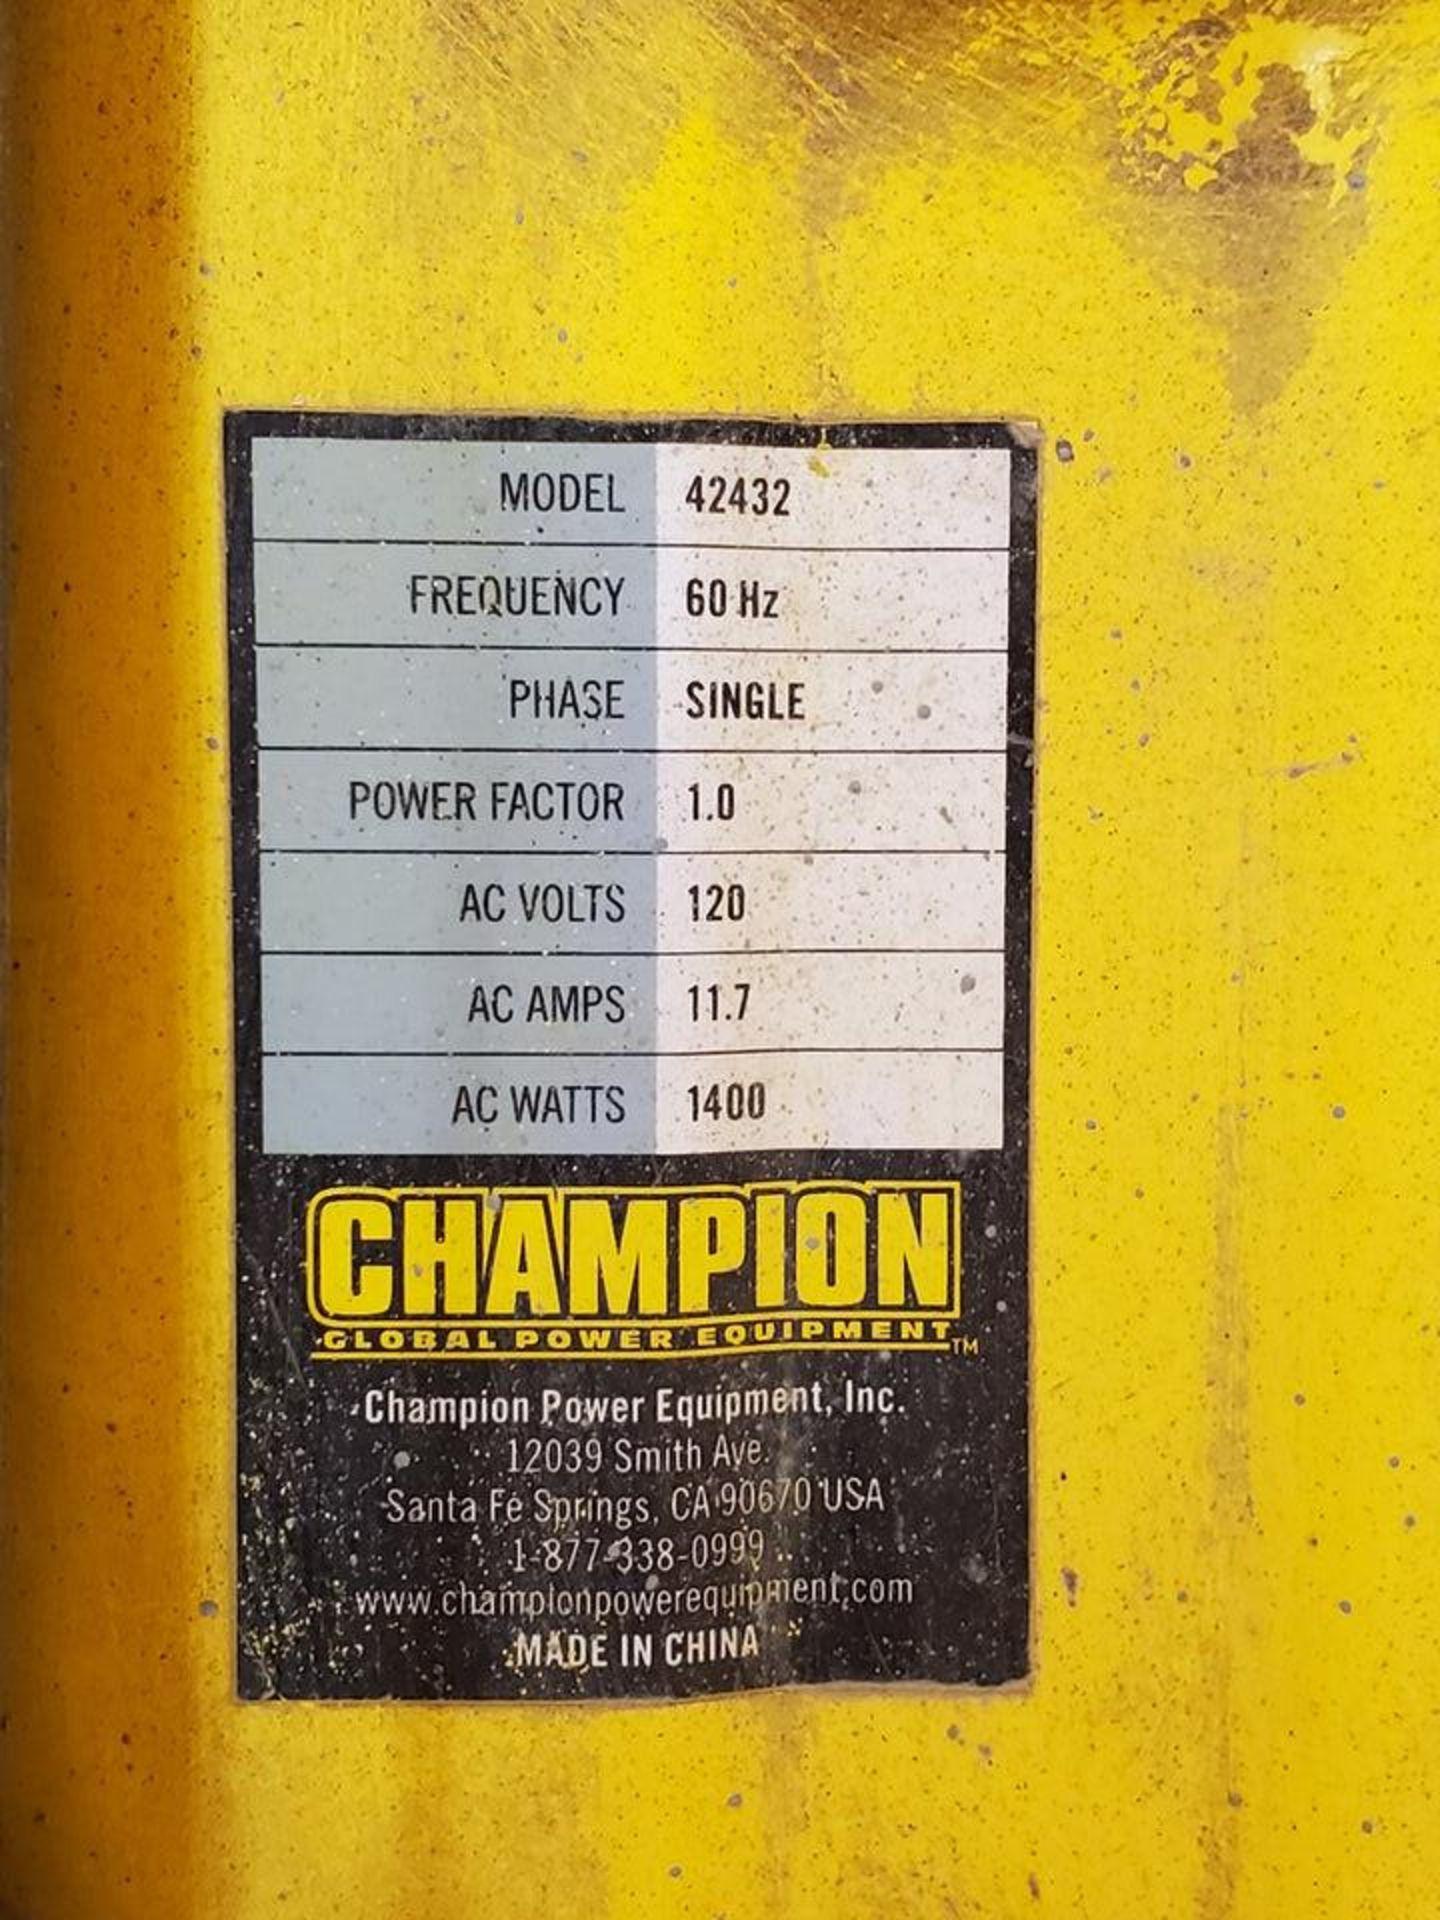 Champion 42432 Portable Generator 1400W, W/ 80cc Engine, 1PH, 60HZ, 120V, 11.7A - Image 7 of 7